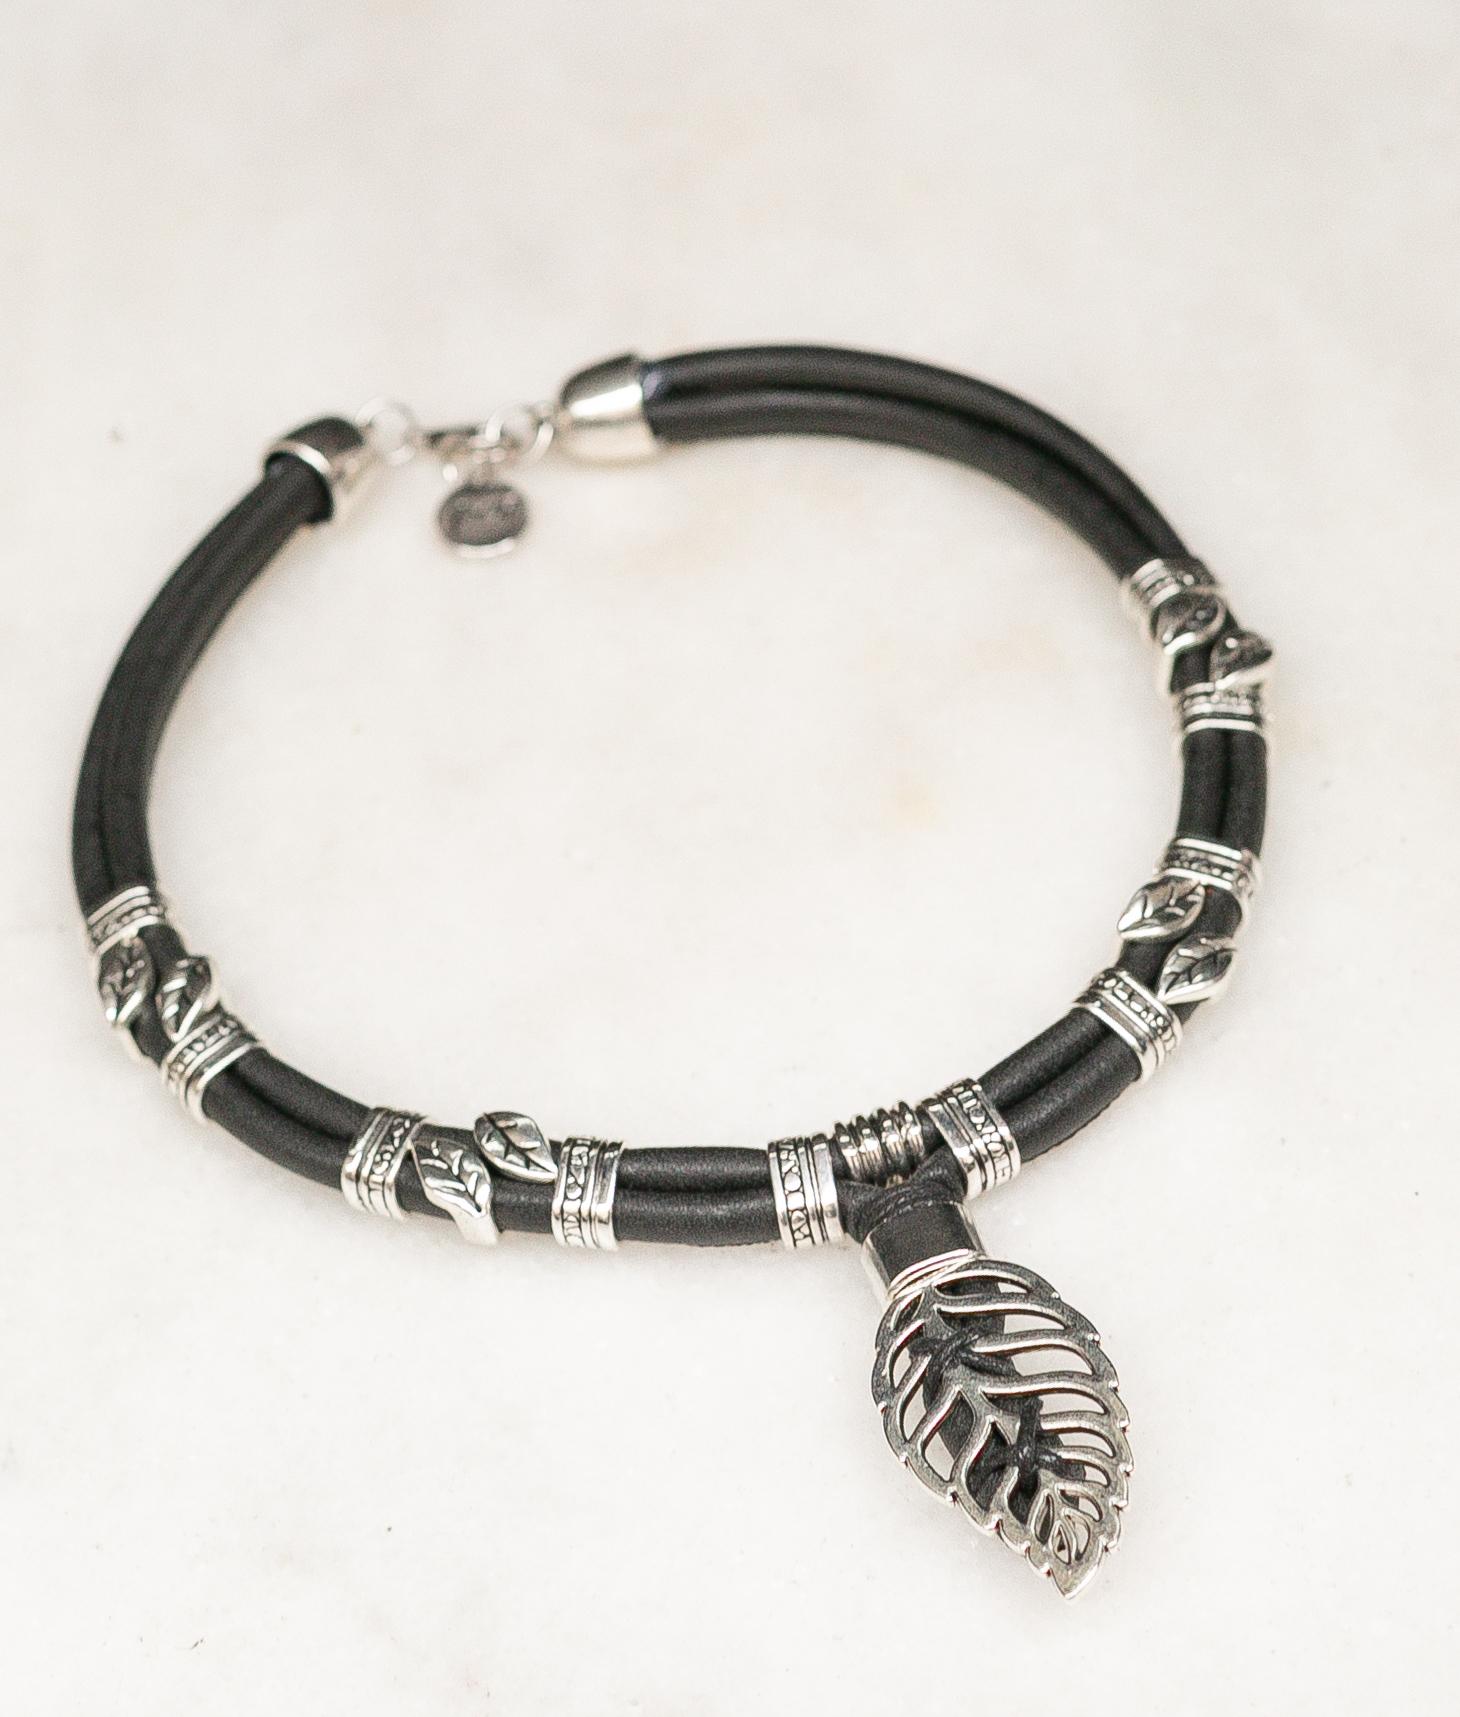 Collier Tiaca - Noir